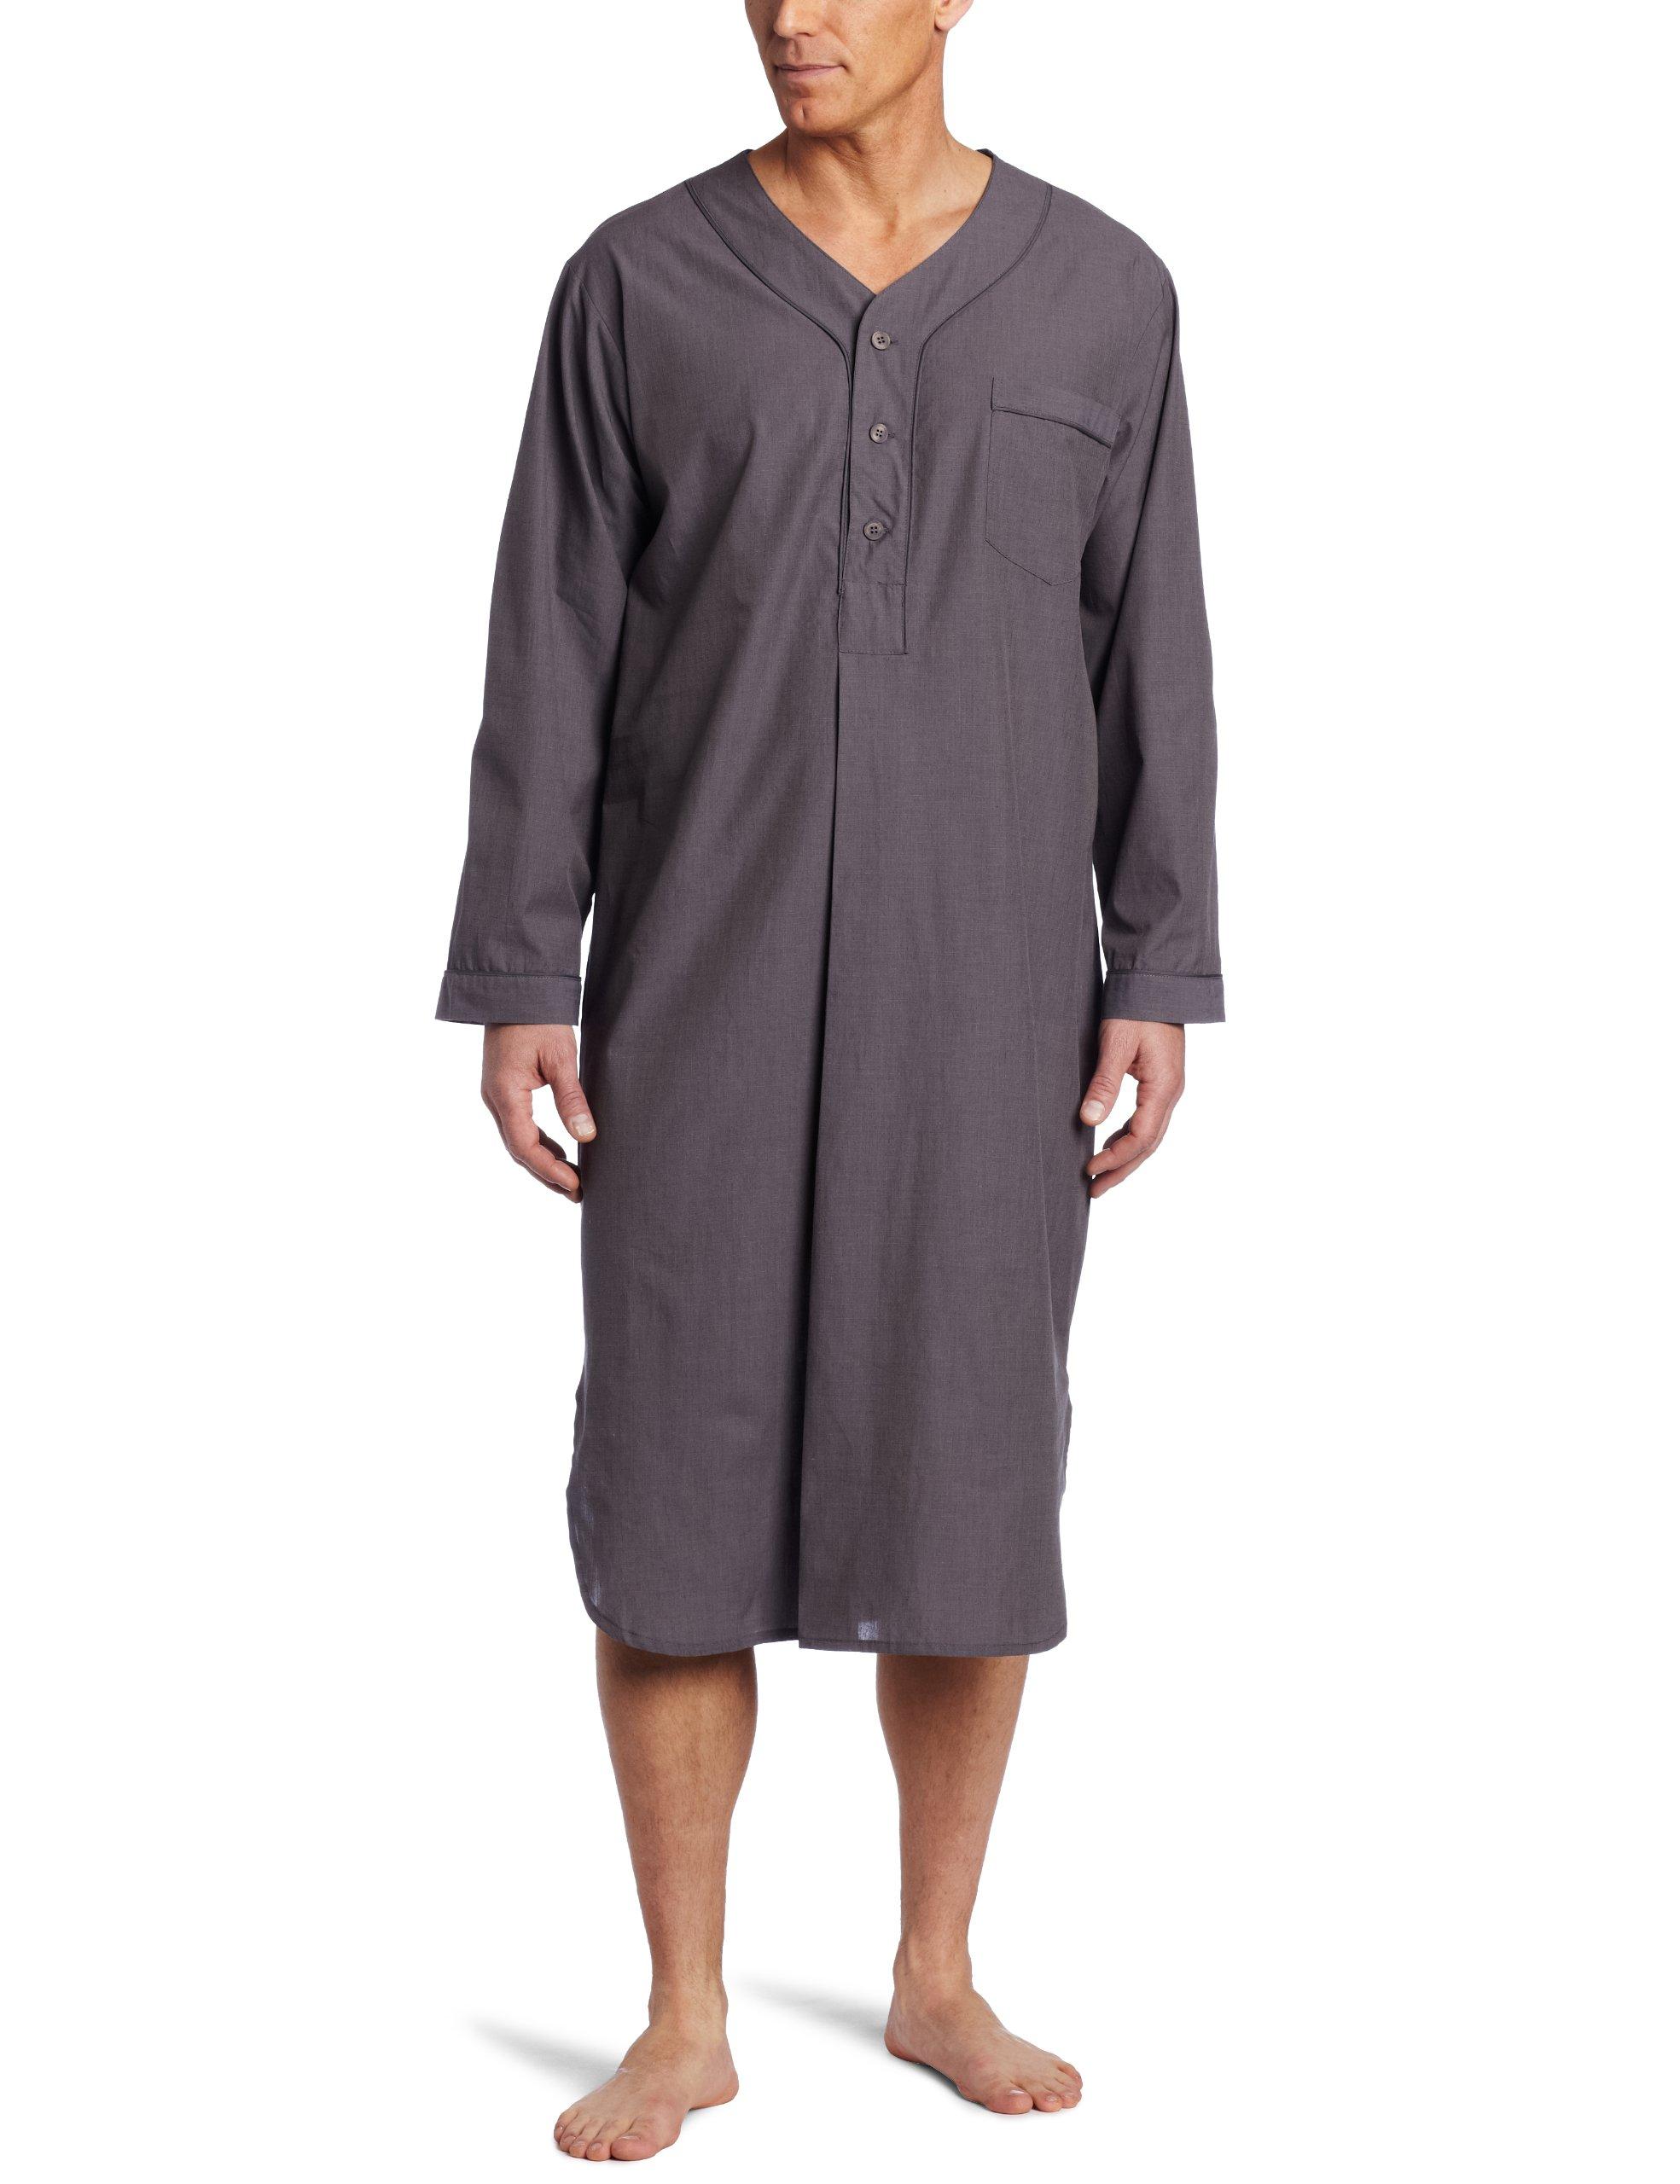 Majestic International Men's Basics Night Shirt, Charcoal, Large/X-Large